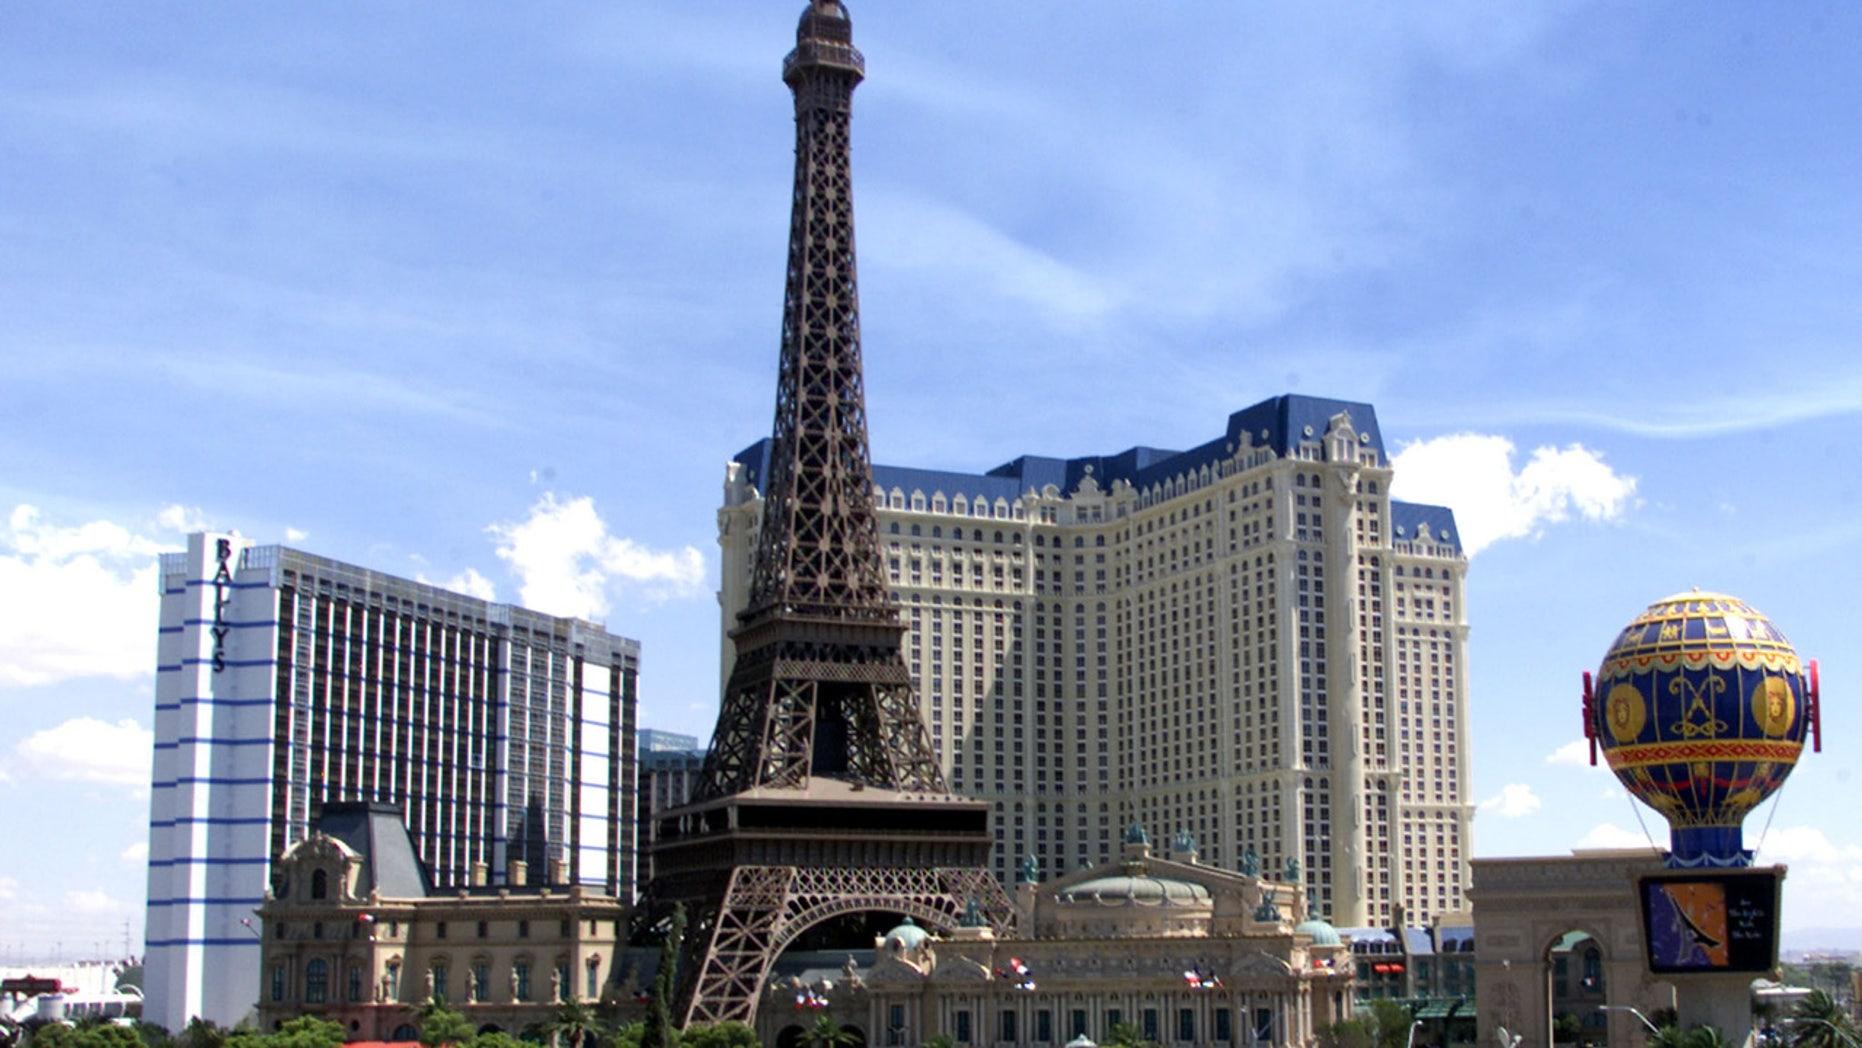 Paris Las Vegas mega-resort in Las Vegas.